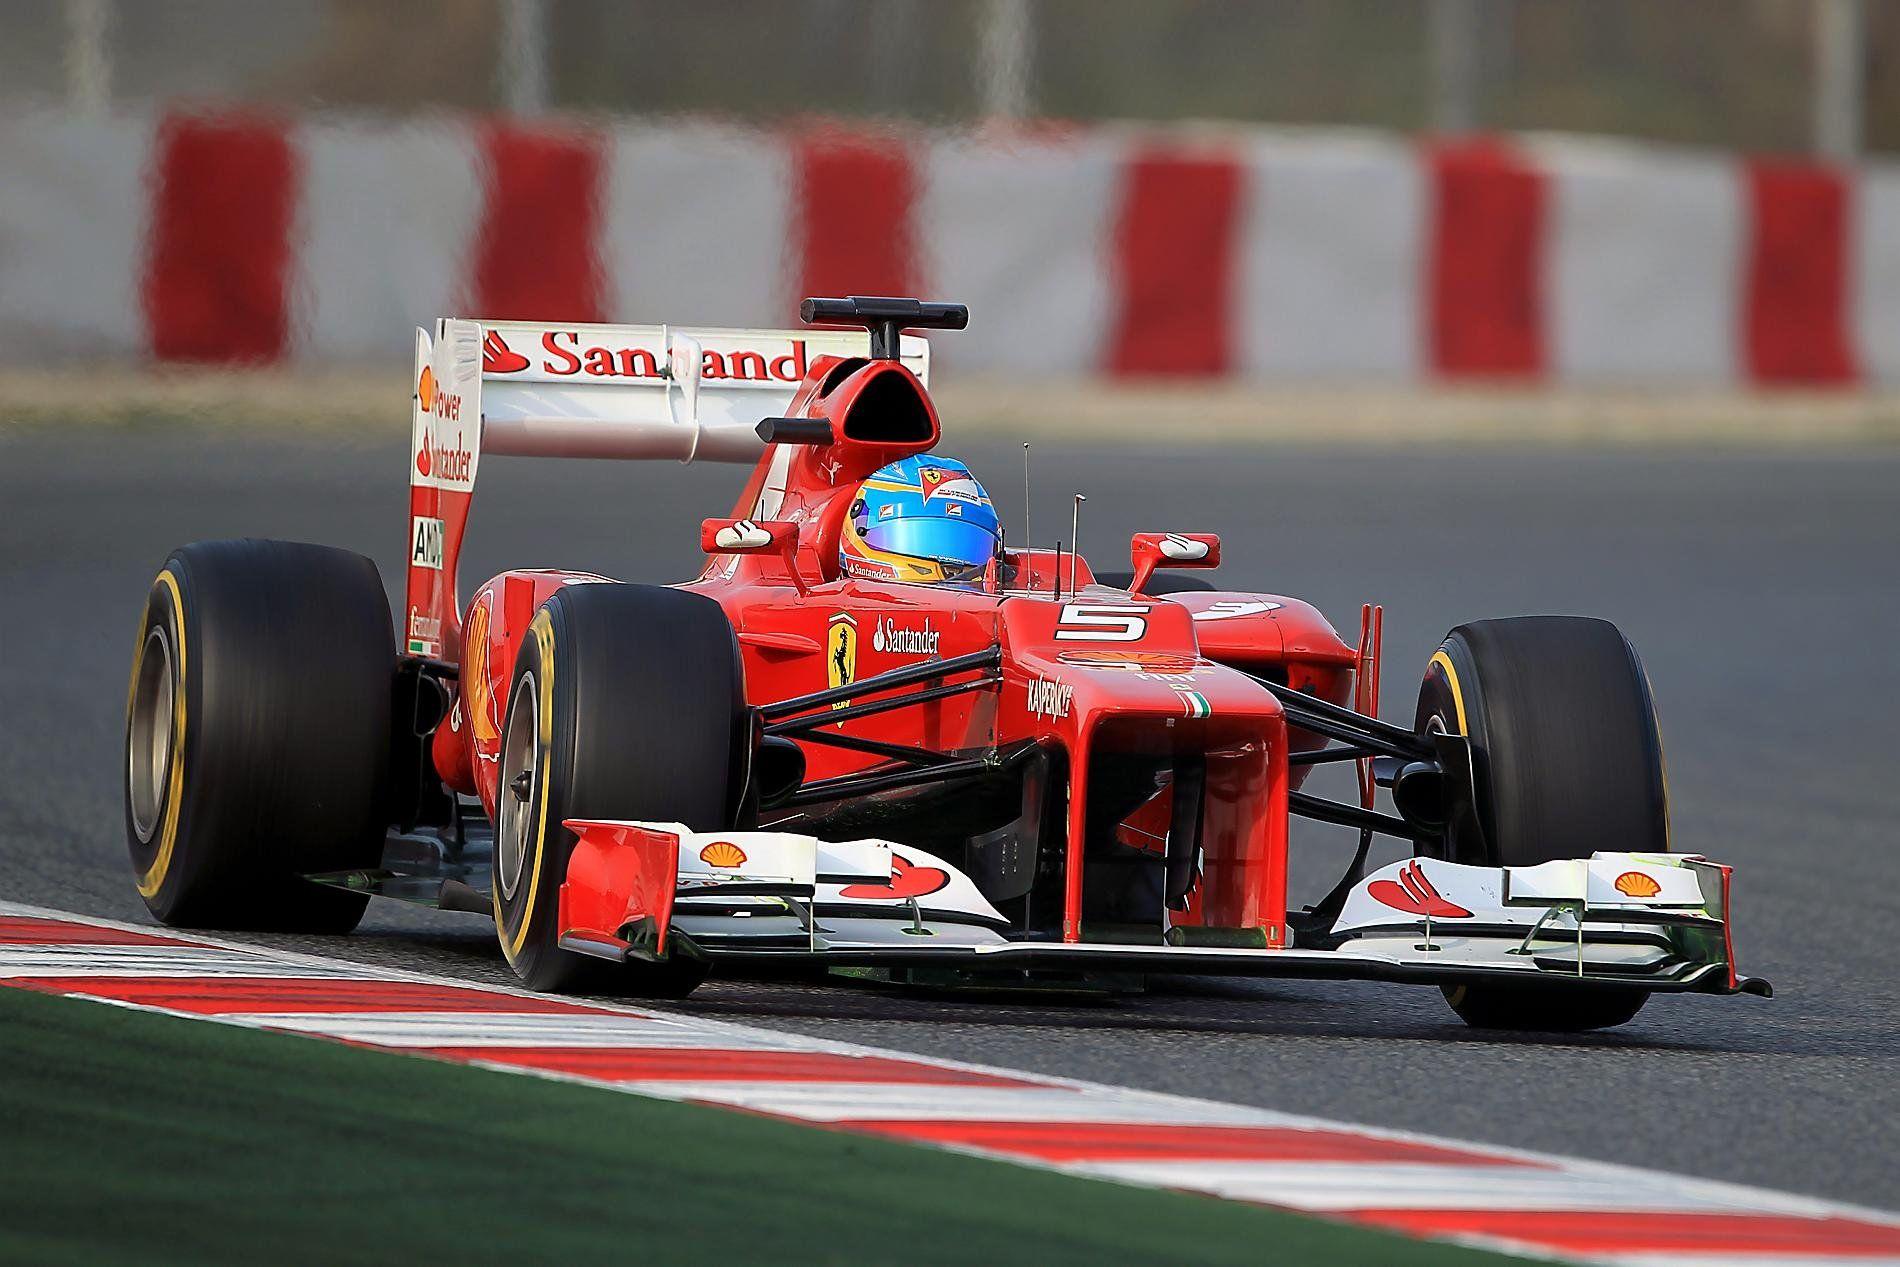 Poll Best Looking 2012 Formula 1 Car Formula 1 Car Formula 1 Car